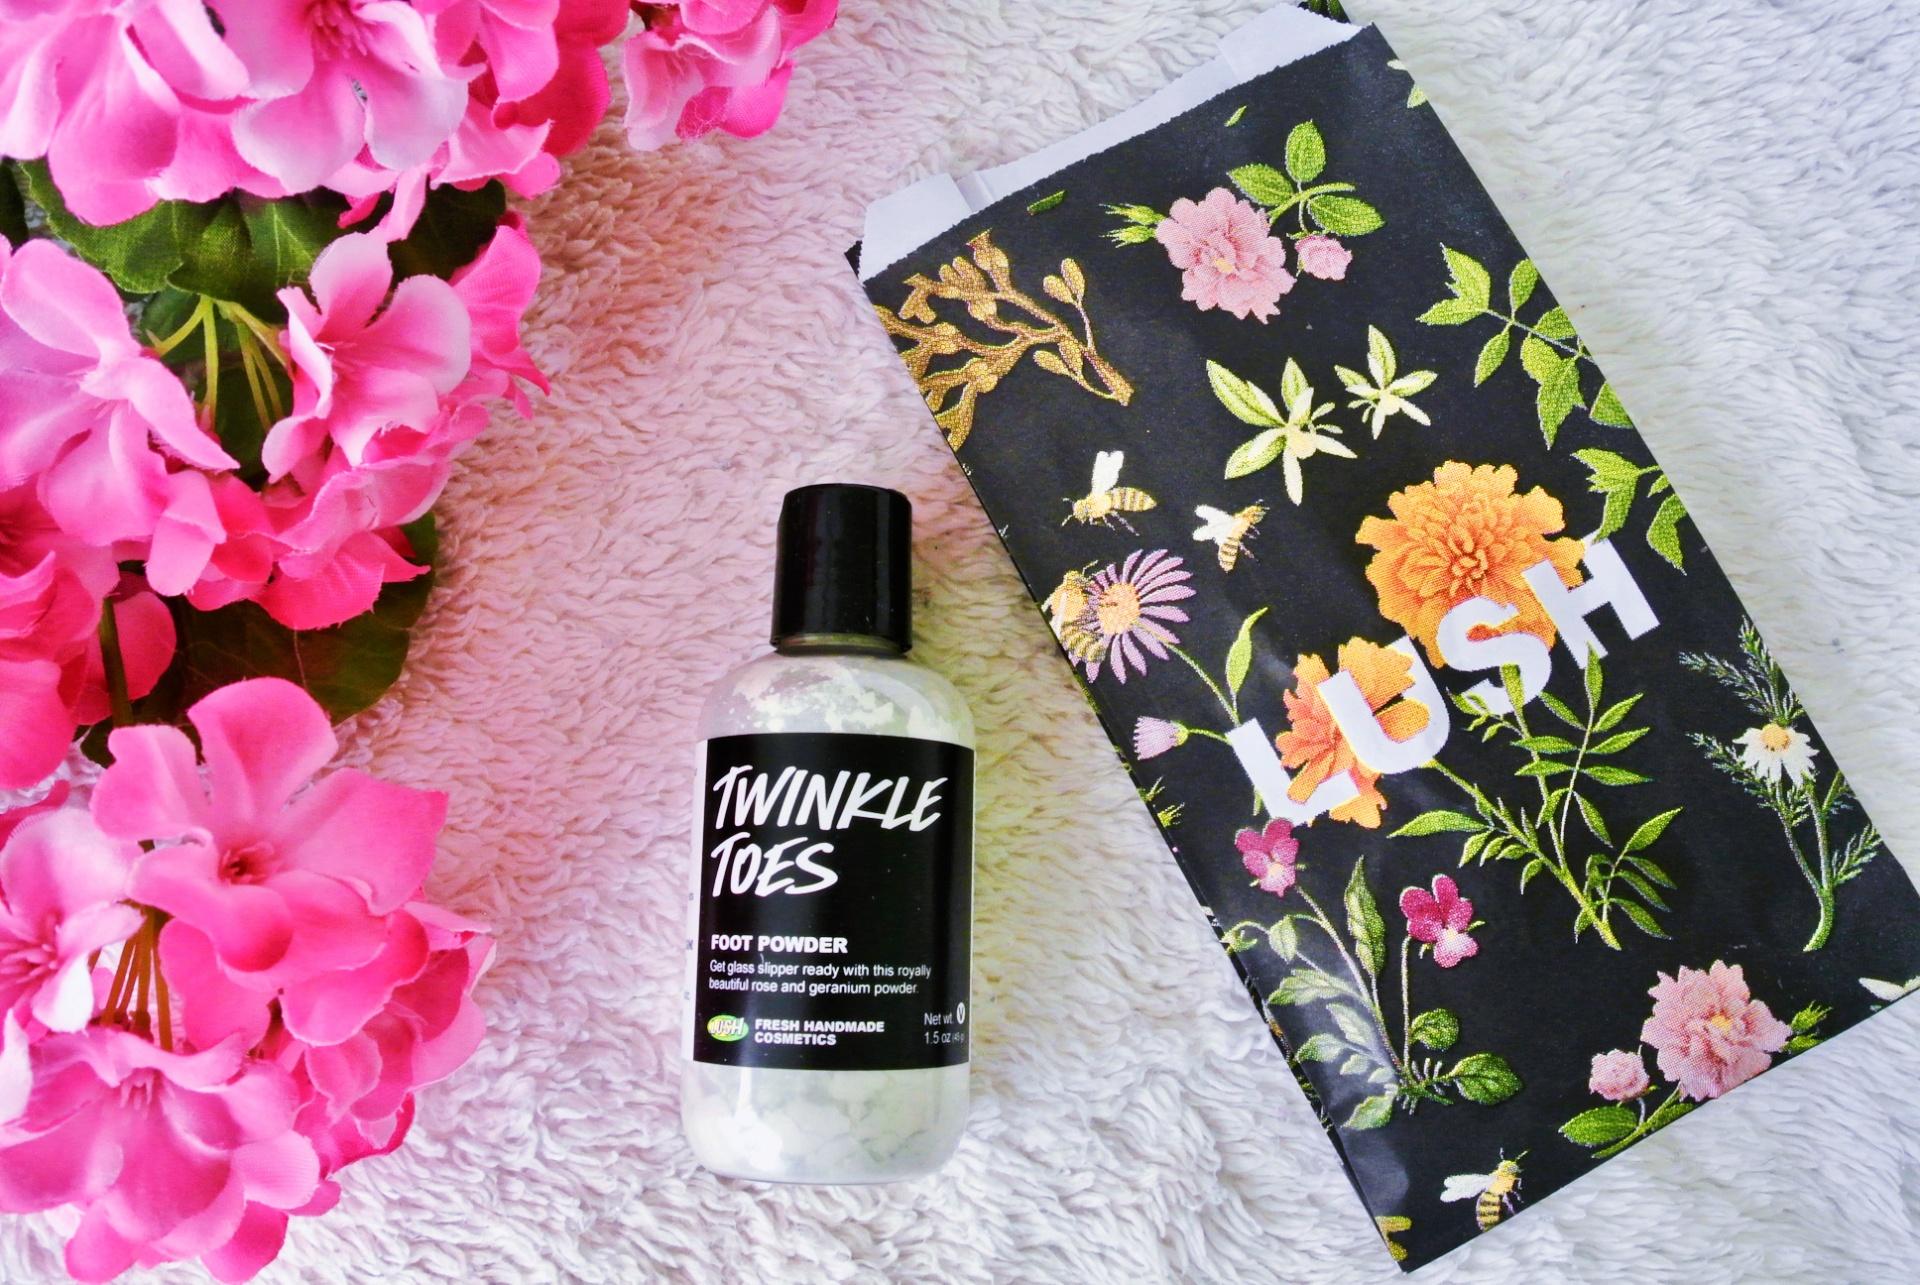 Lush Cosmetics Spring Mini-Haul // Twinkle Toes Foot Powder